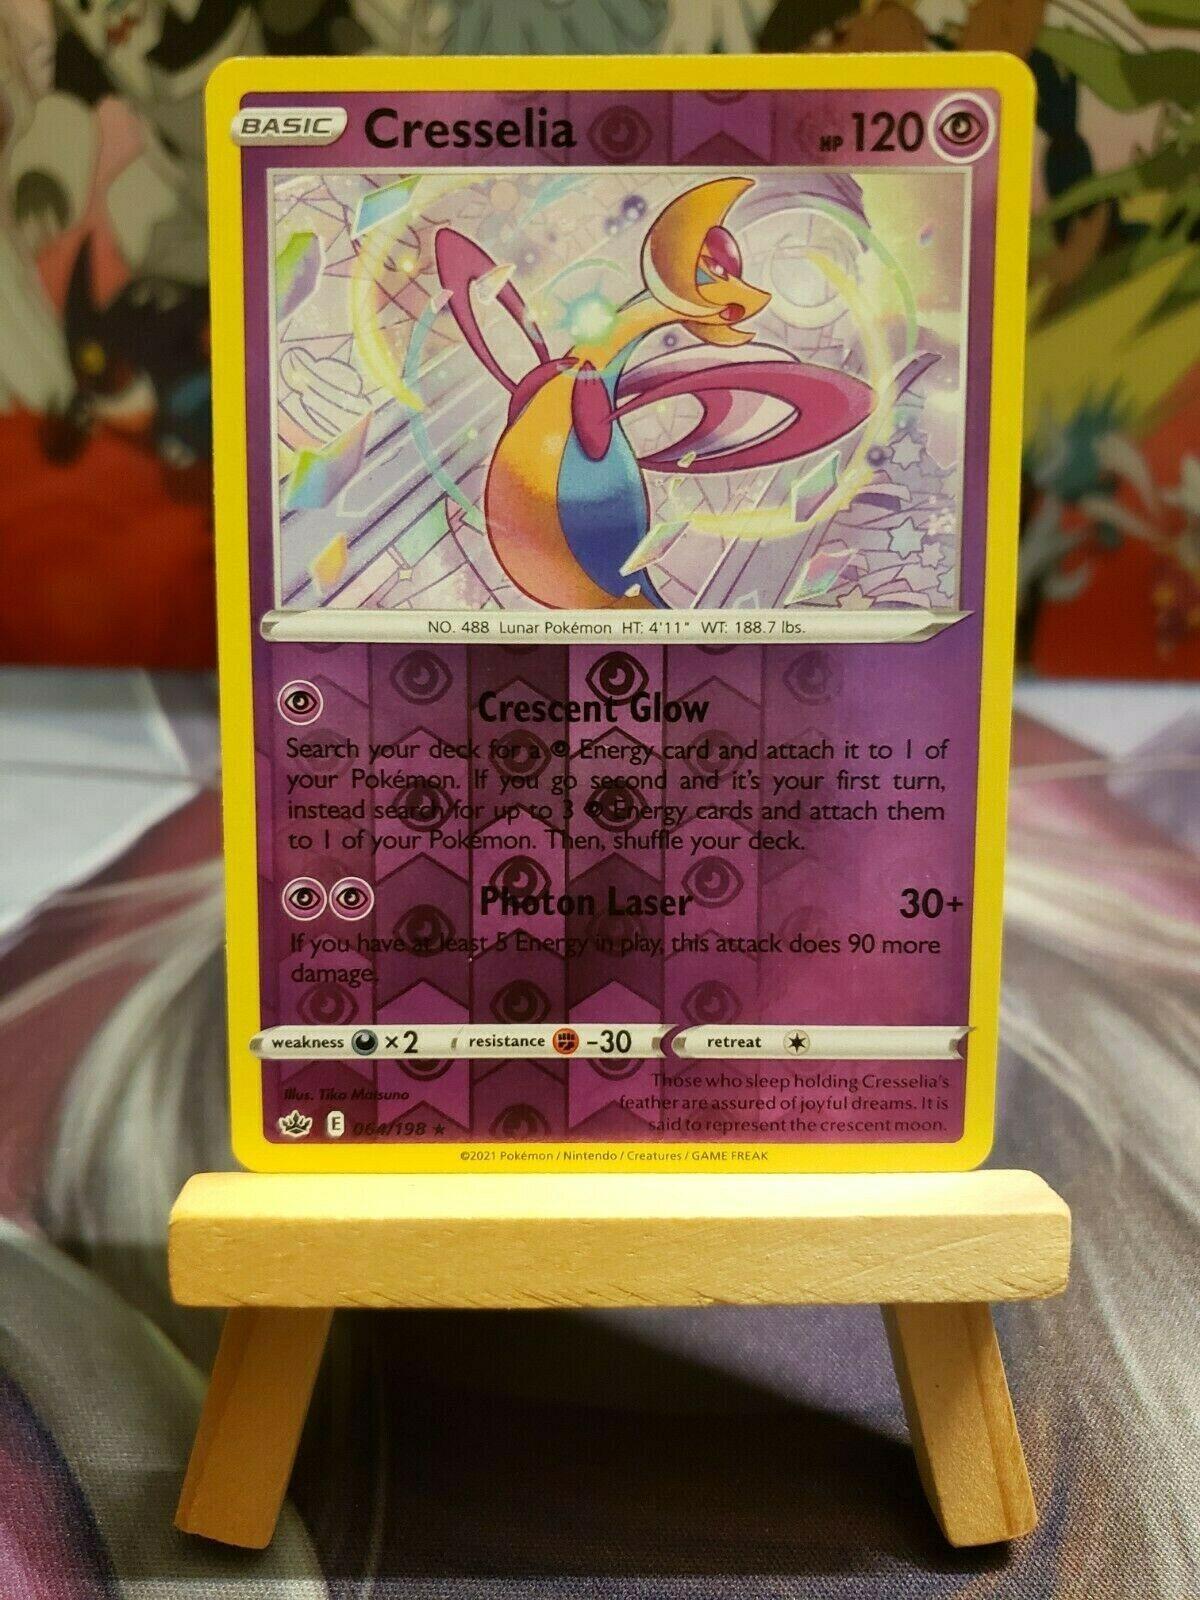 Cresselia [064/198] Reverse Holo Rare, SWSH Chilling Reign, Pokemon TCG